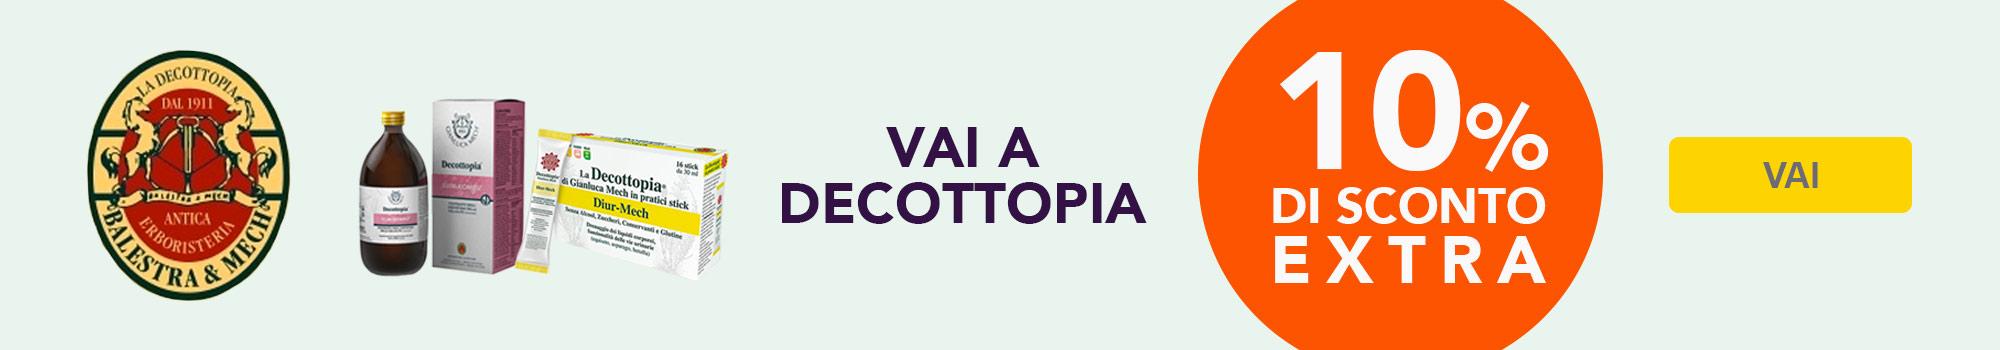 decottopia